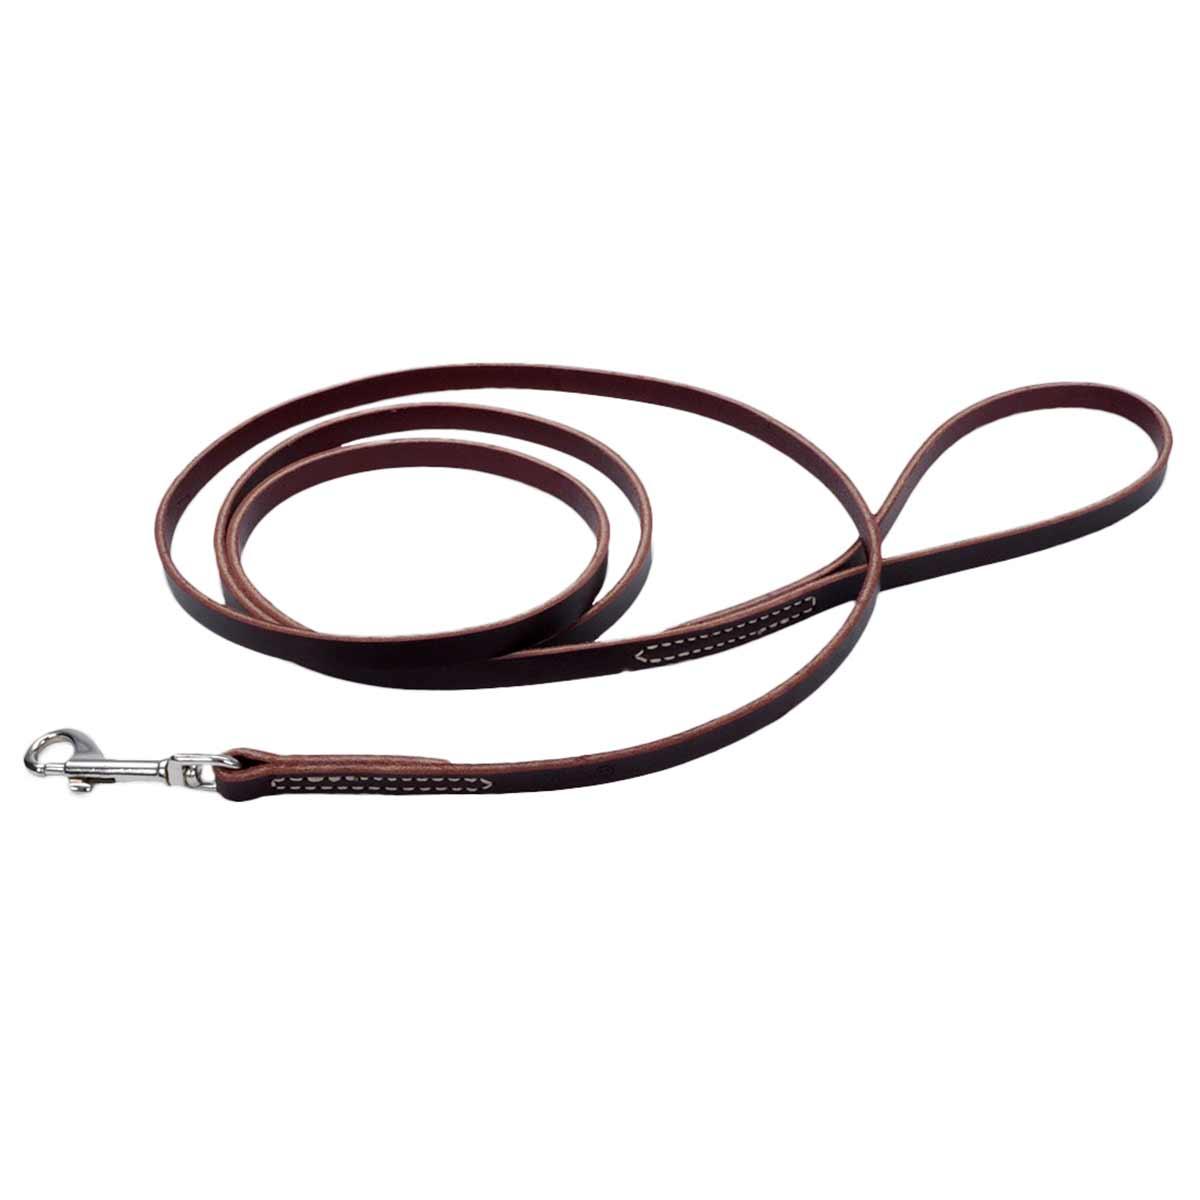 Brown Flat Latigo Leather Training Lead for Dogs - 3/8 inch by 6 feet